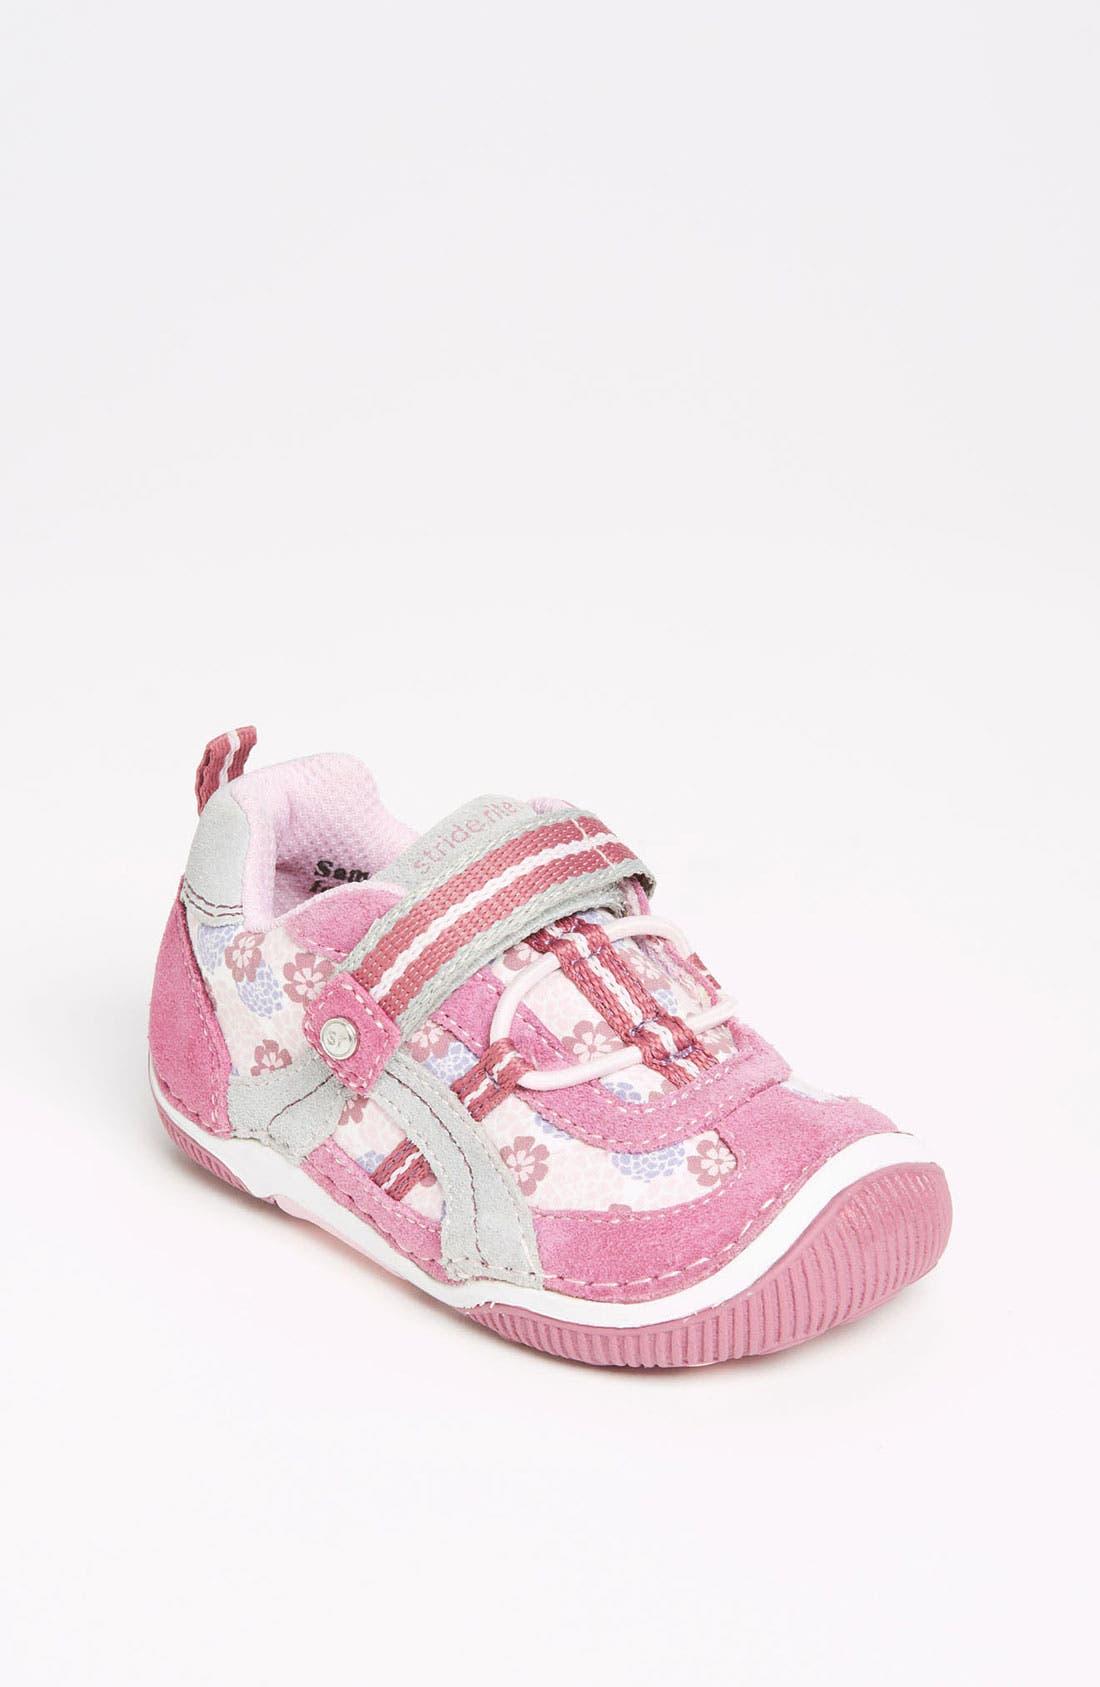 Main Image - Stride Rite 'Maive' Sneaker (Baby, Walker & Toddler)